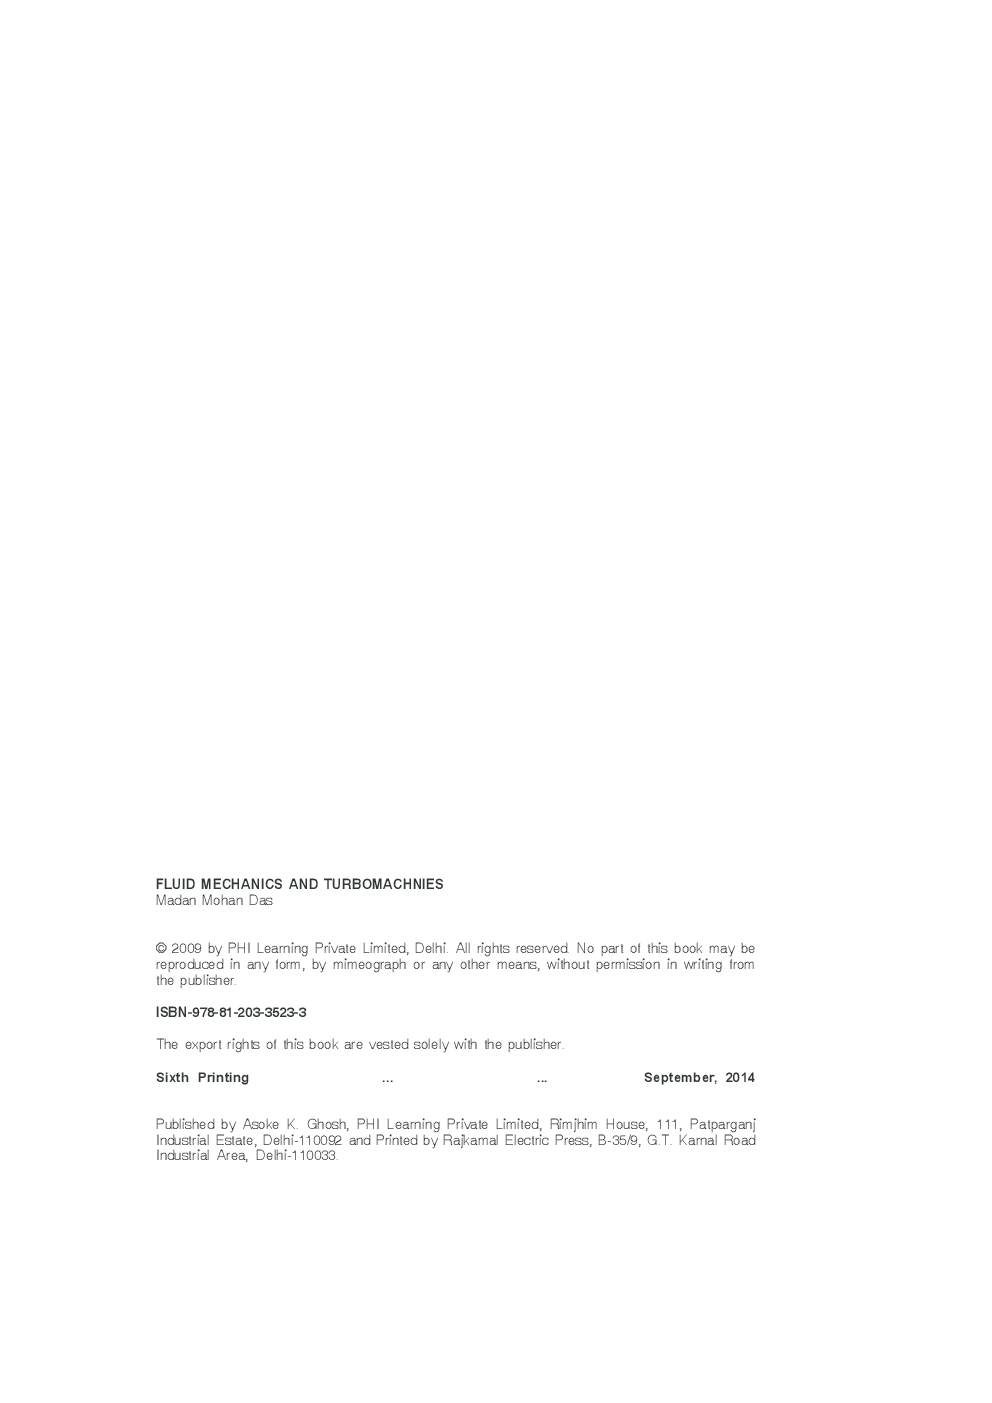 Fluid Mechanics And Turbomachines - Page 3